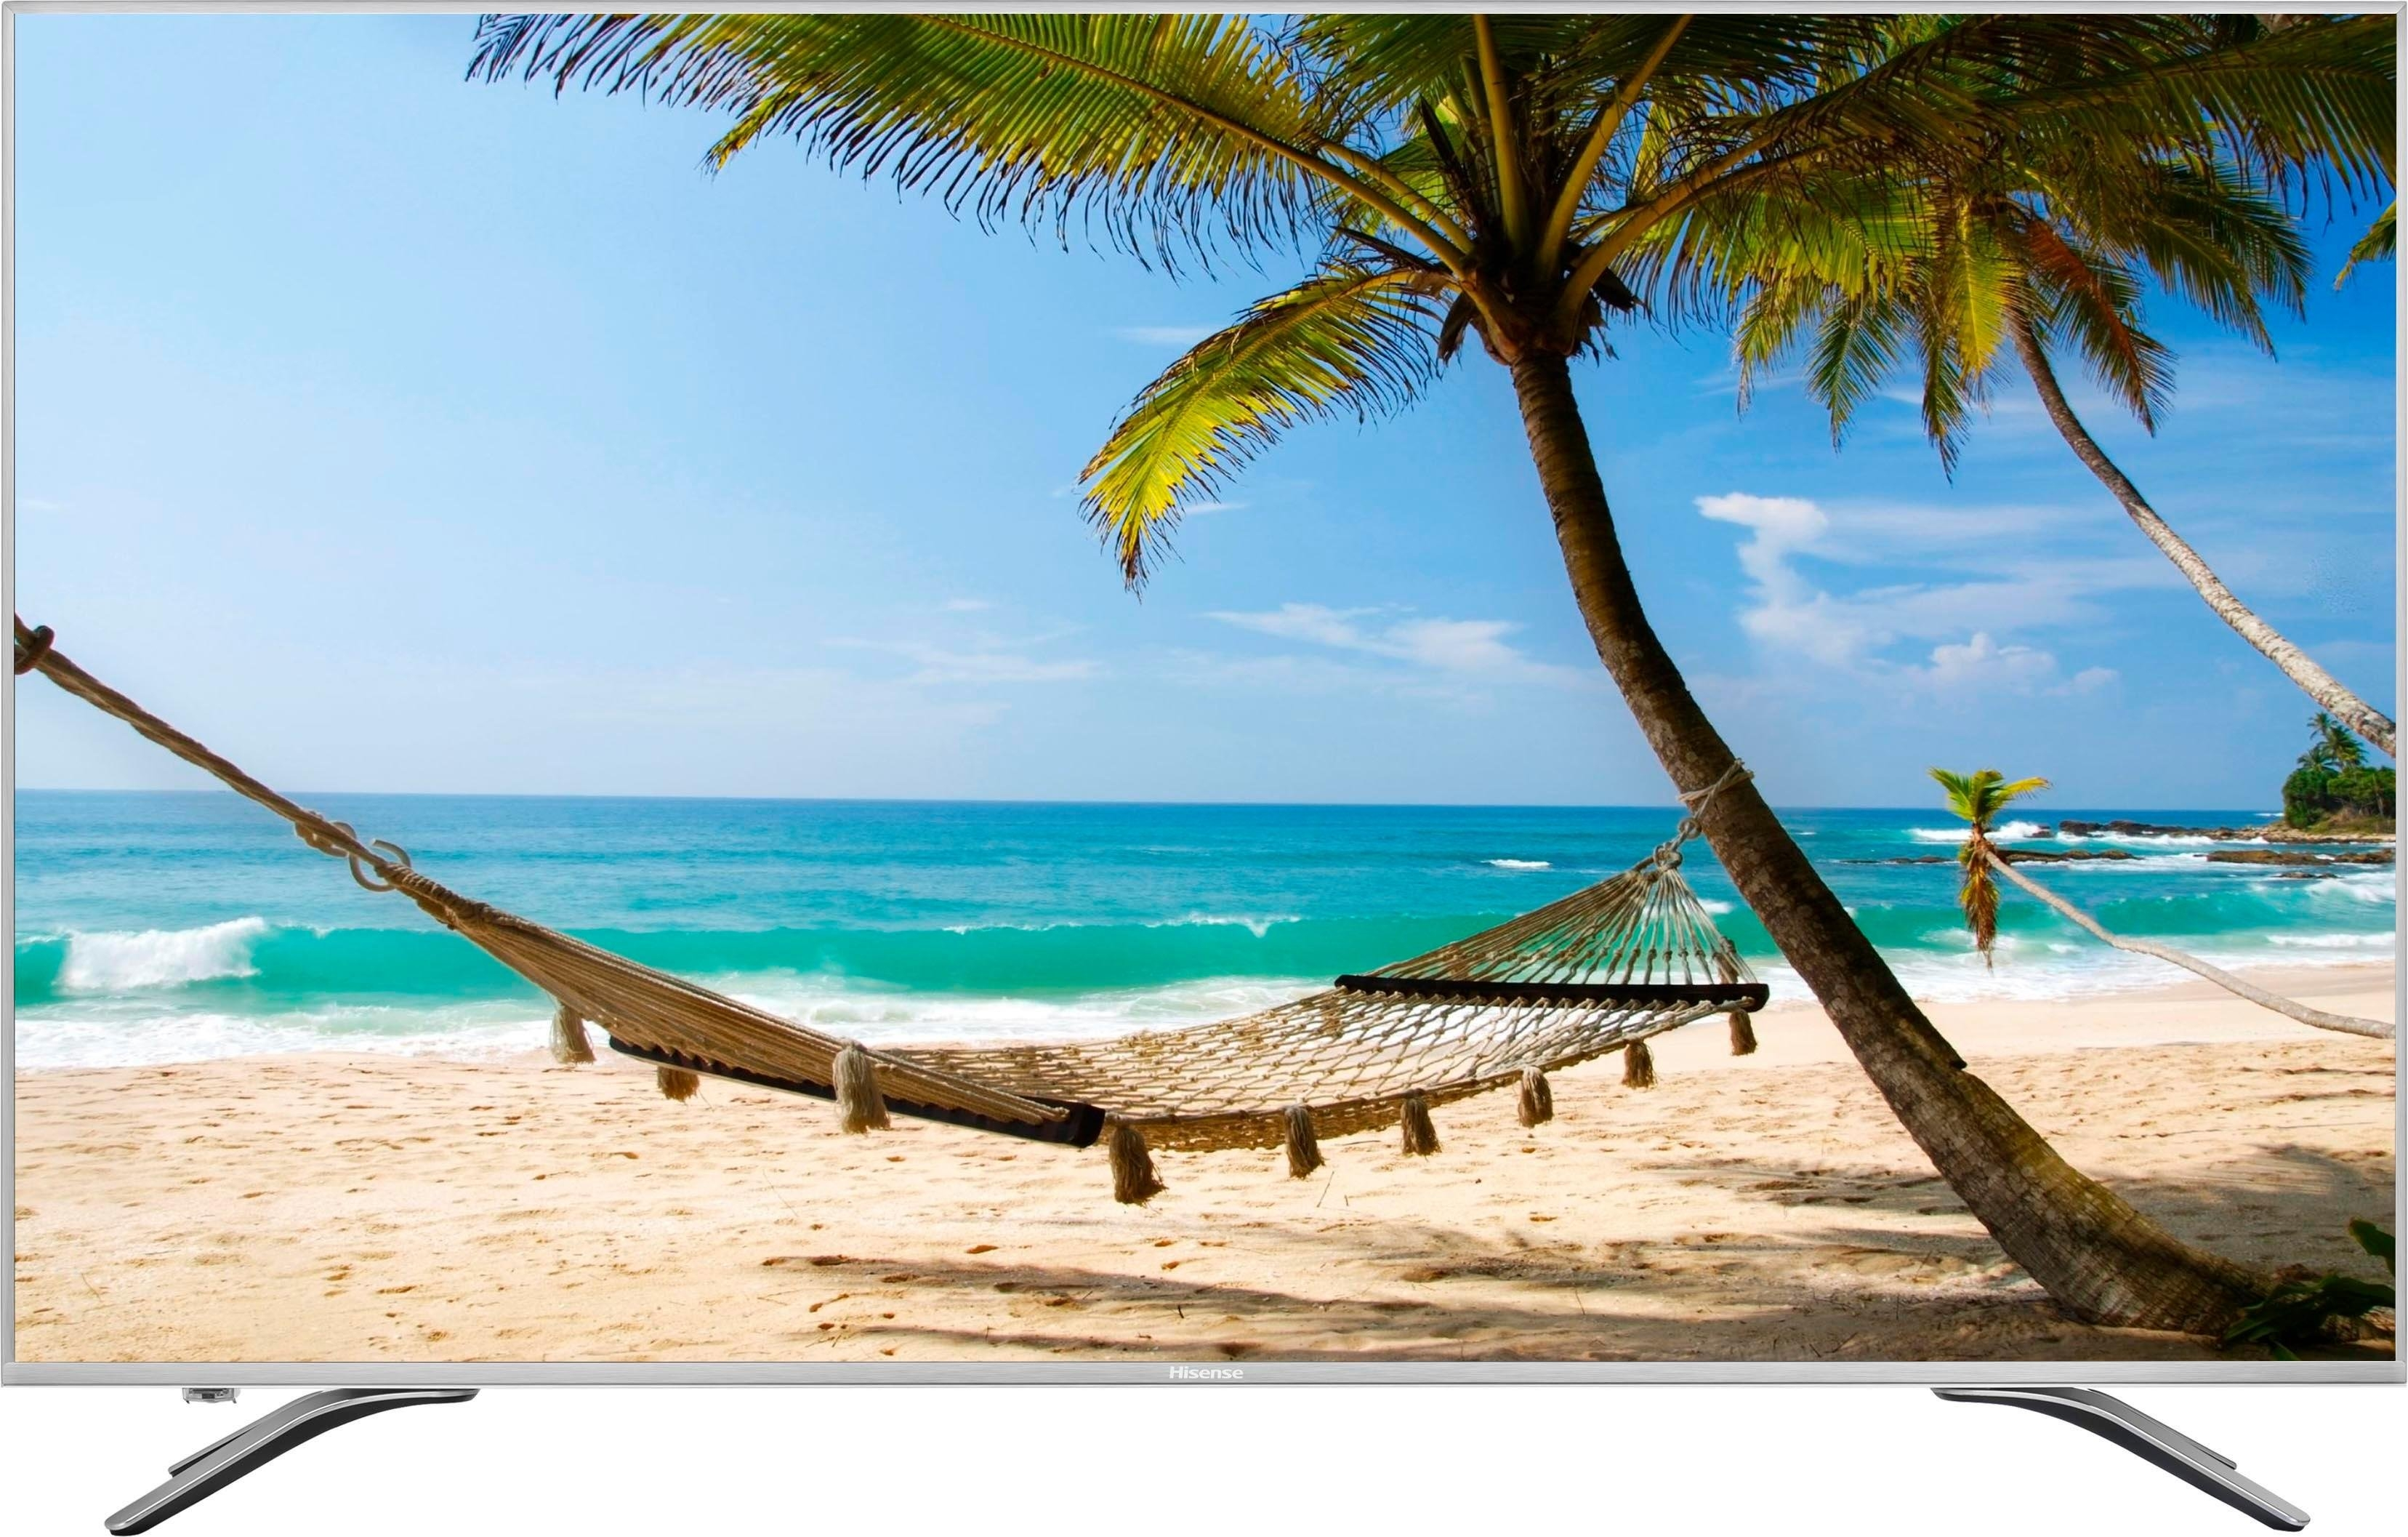 Hisense H55A6500 led-tv (138 cm / (55 inch), 4K Ultra HD, Smart-TV nu online kopen bij OTTO